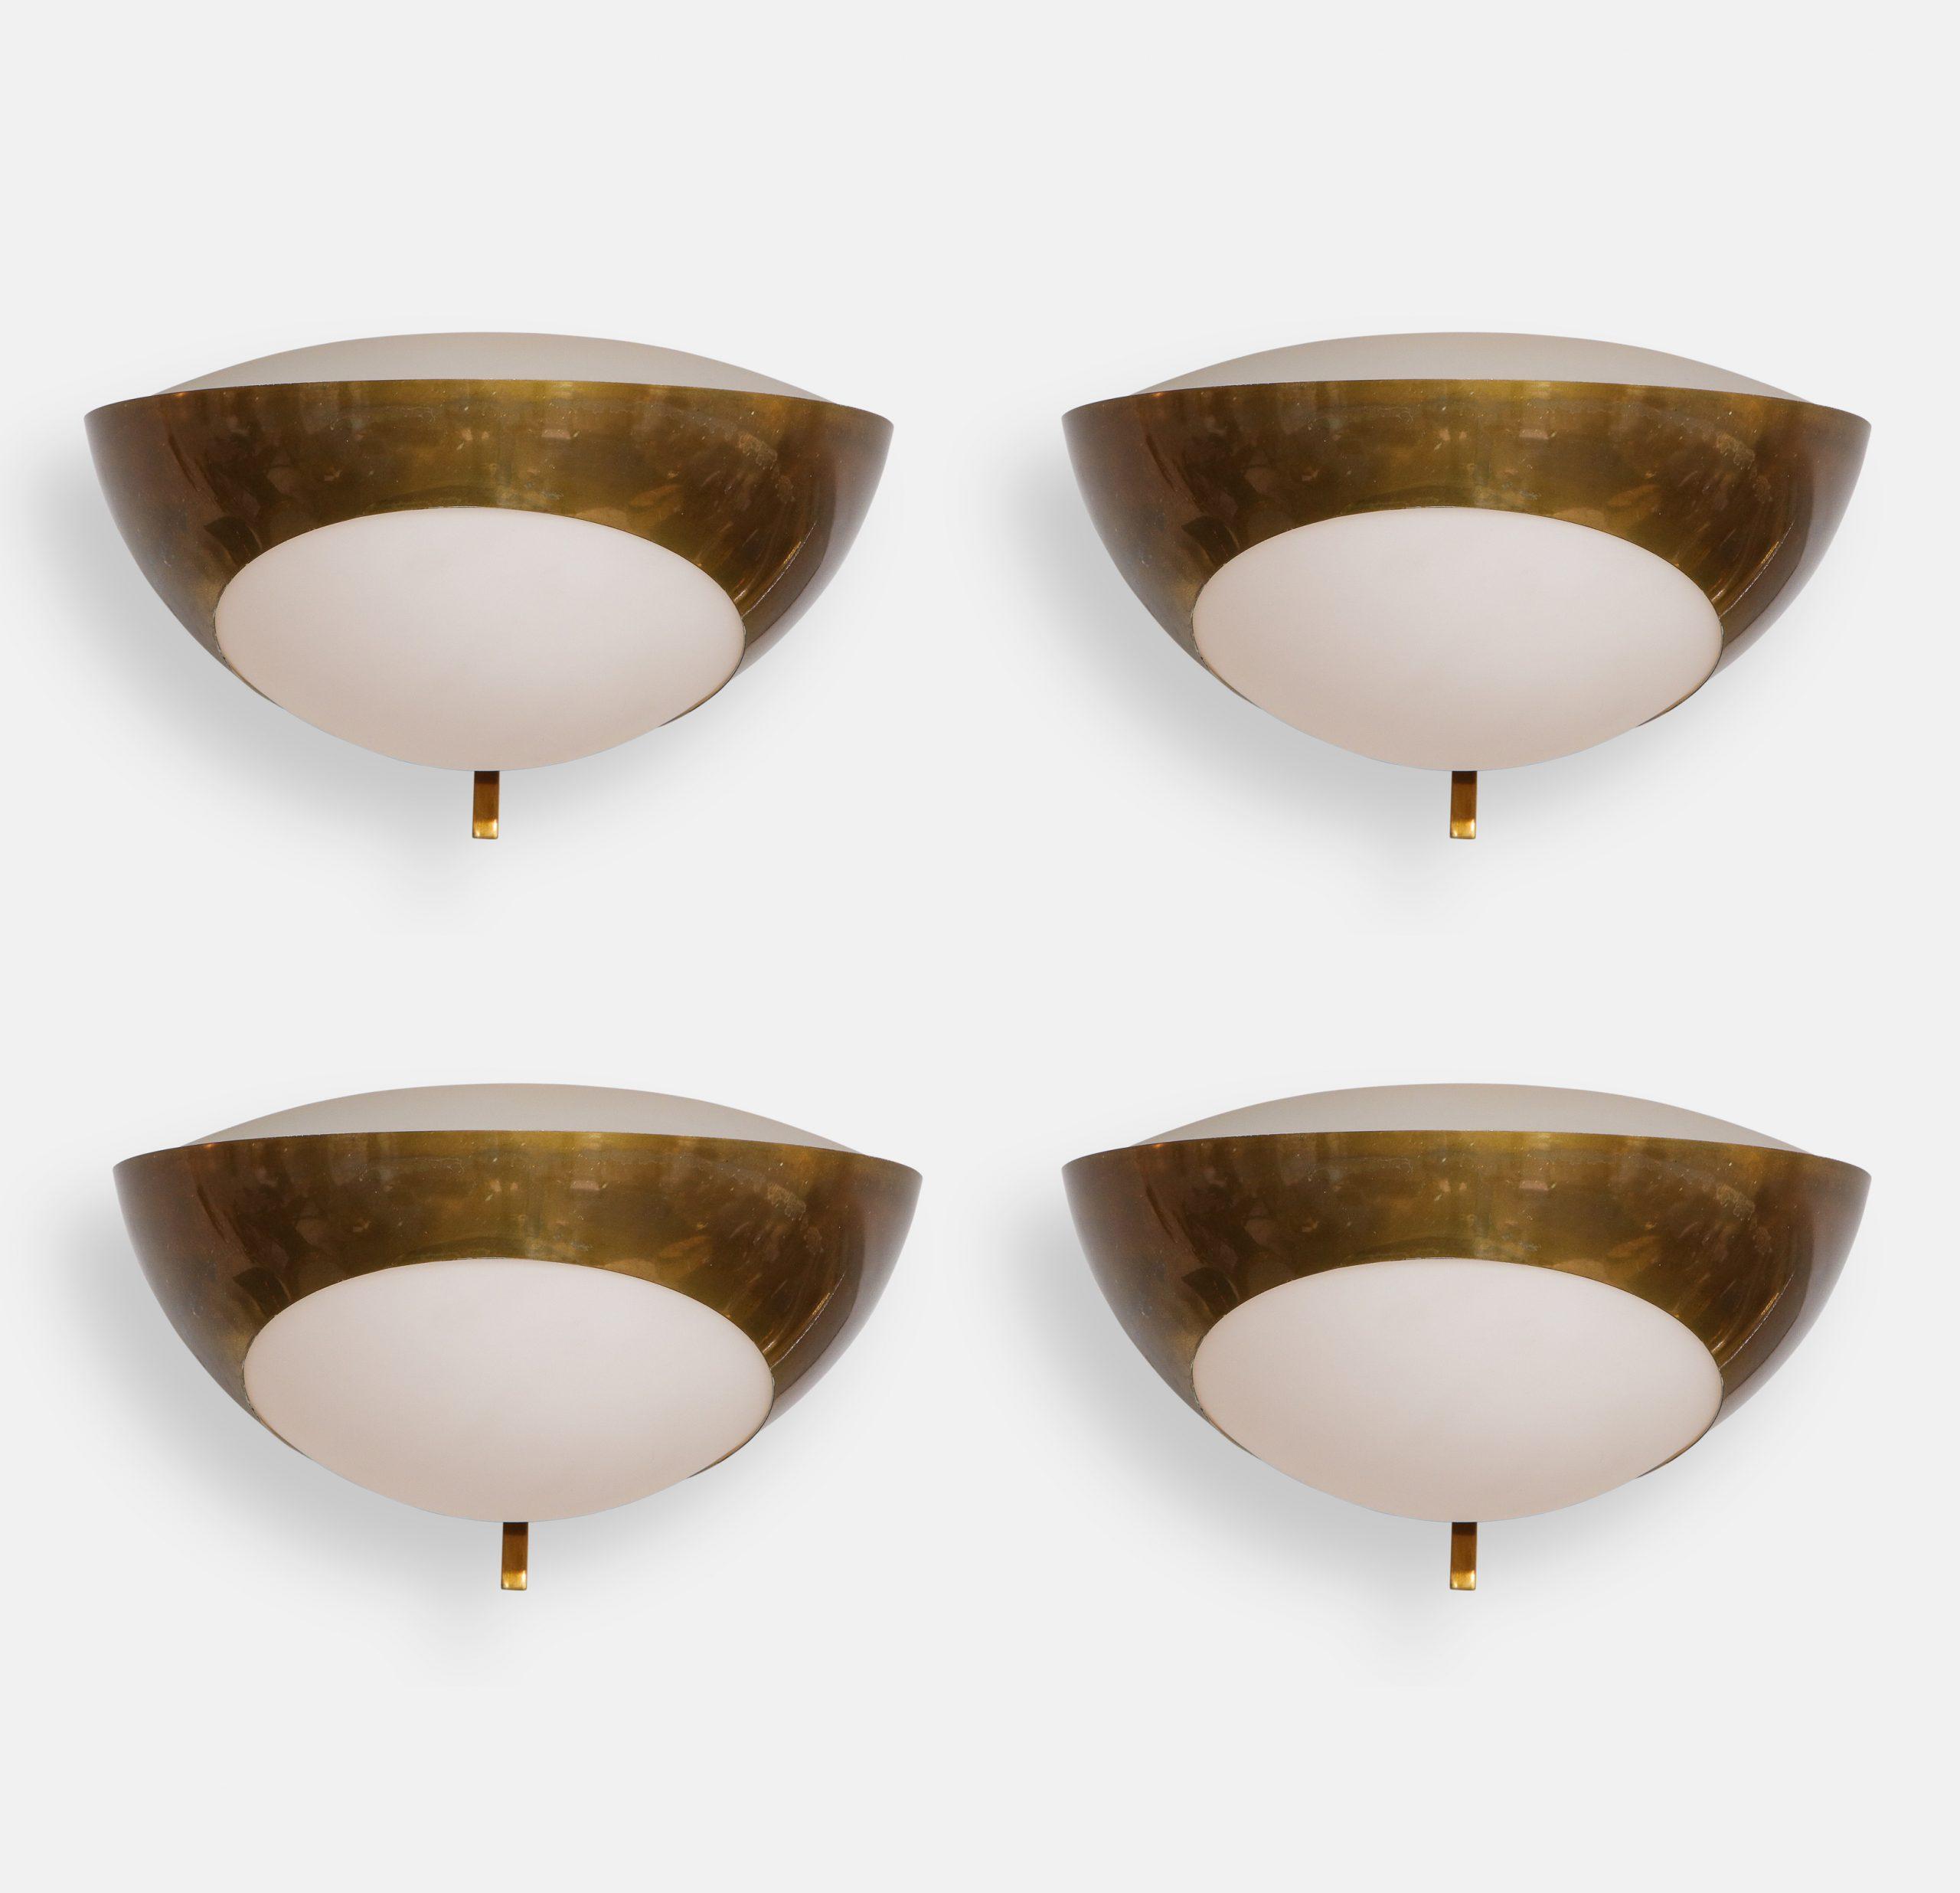 Set of Four Large Sconces Model 1963 by Max Ingrand for Fontana Arte | soyun k.